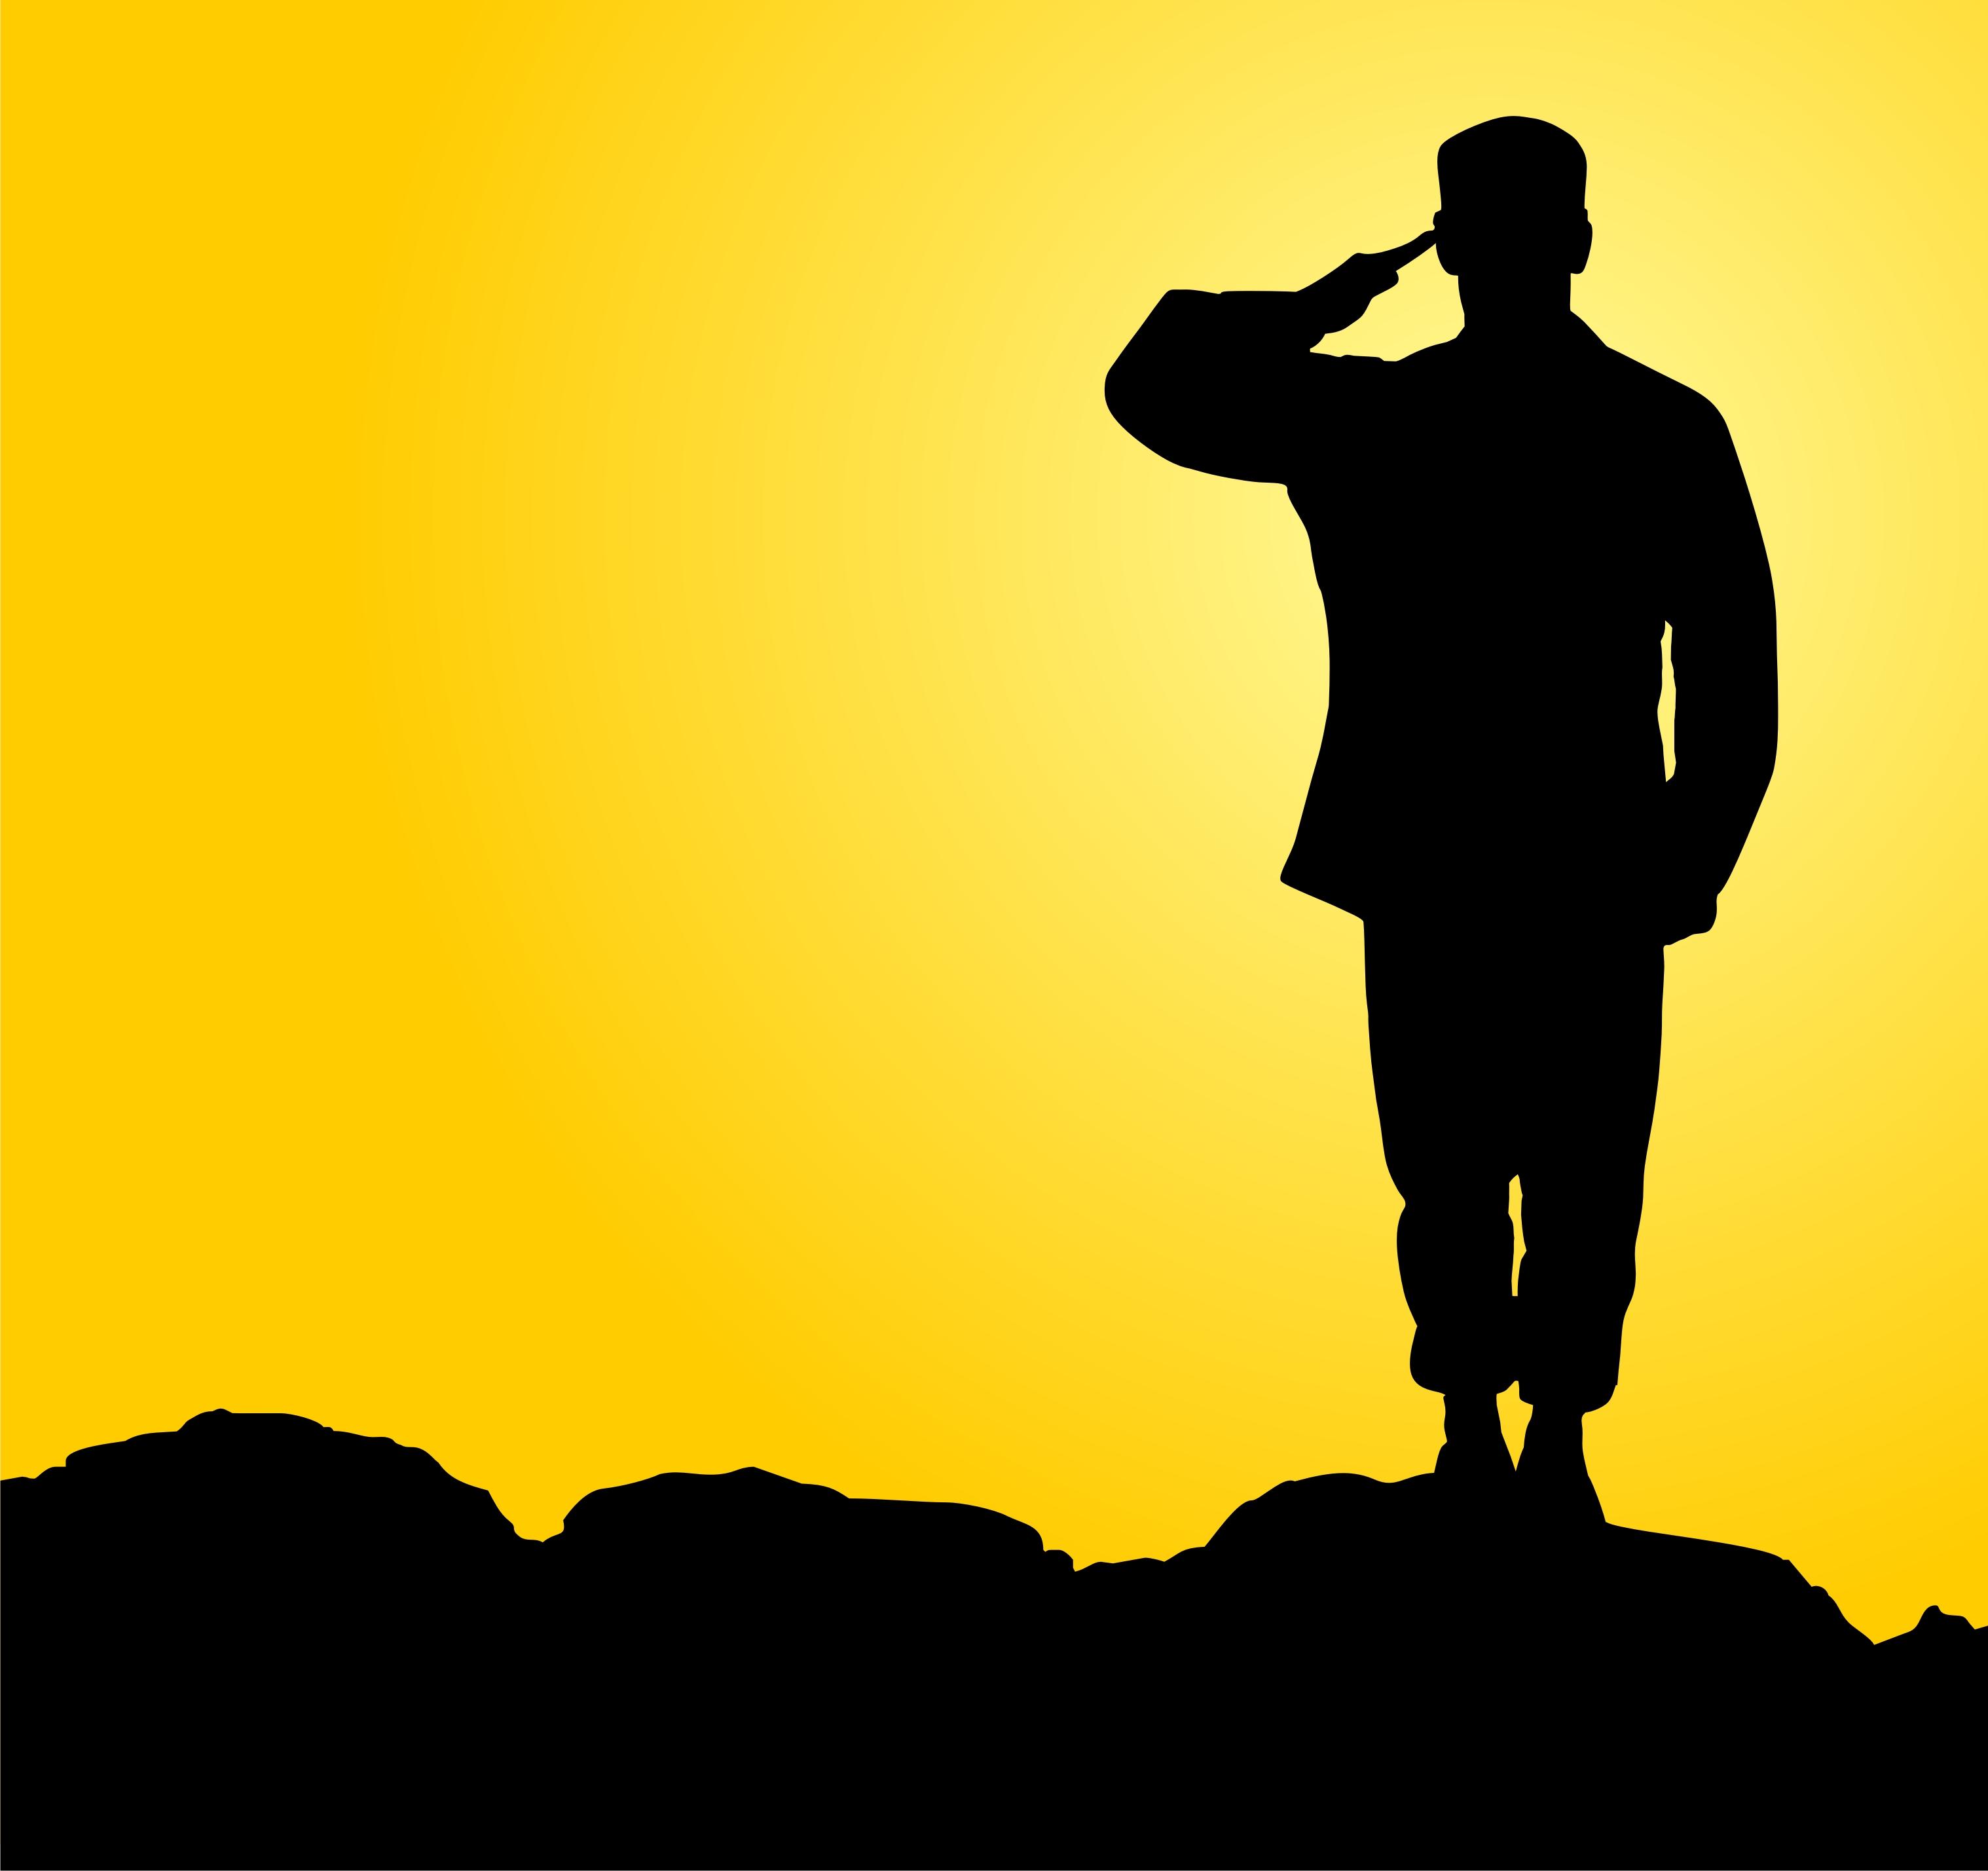 3036x2857 48983ca4f4c5ab014c2c173d54e02c86 Images For Soldier Saluting